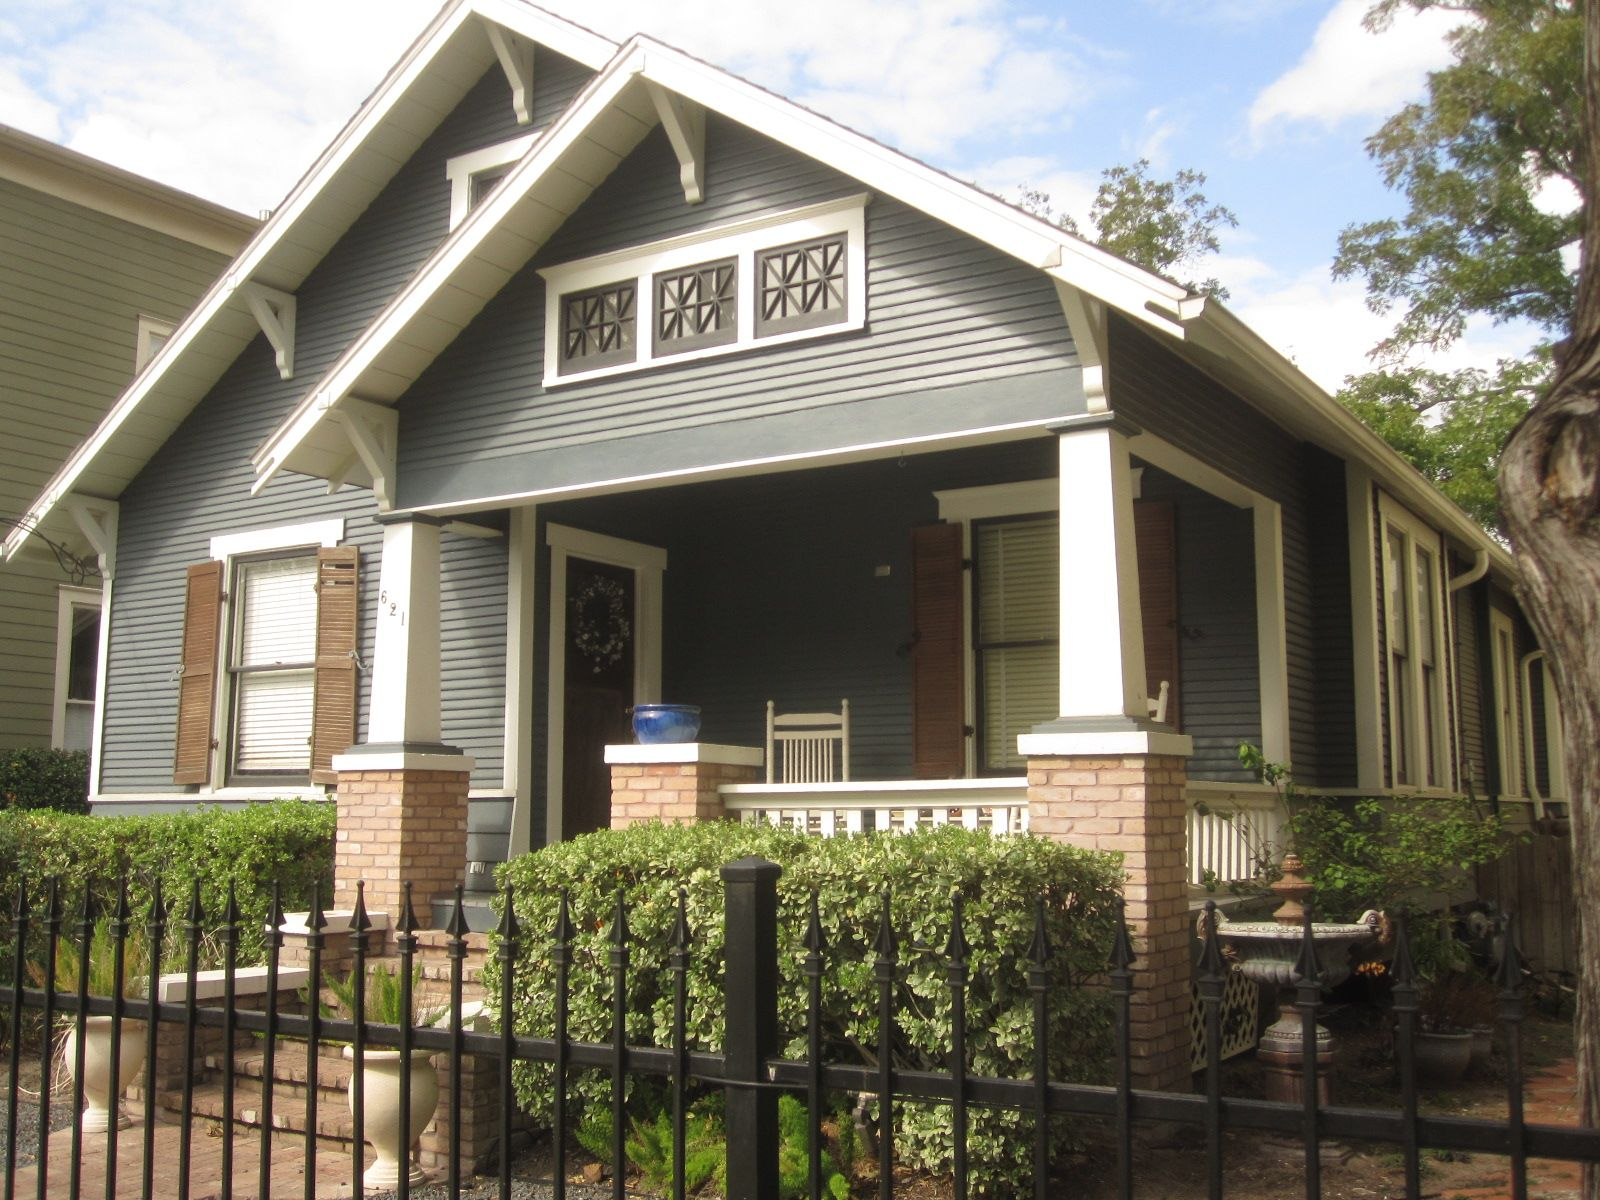 Bungalows paint colors and exterior paint on pinterest - The Other Houston More Beautiful Bungalow Paint Colors